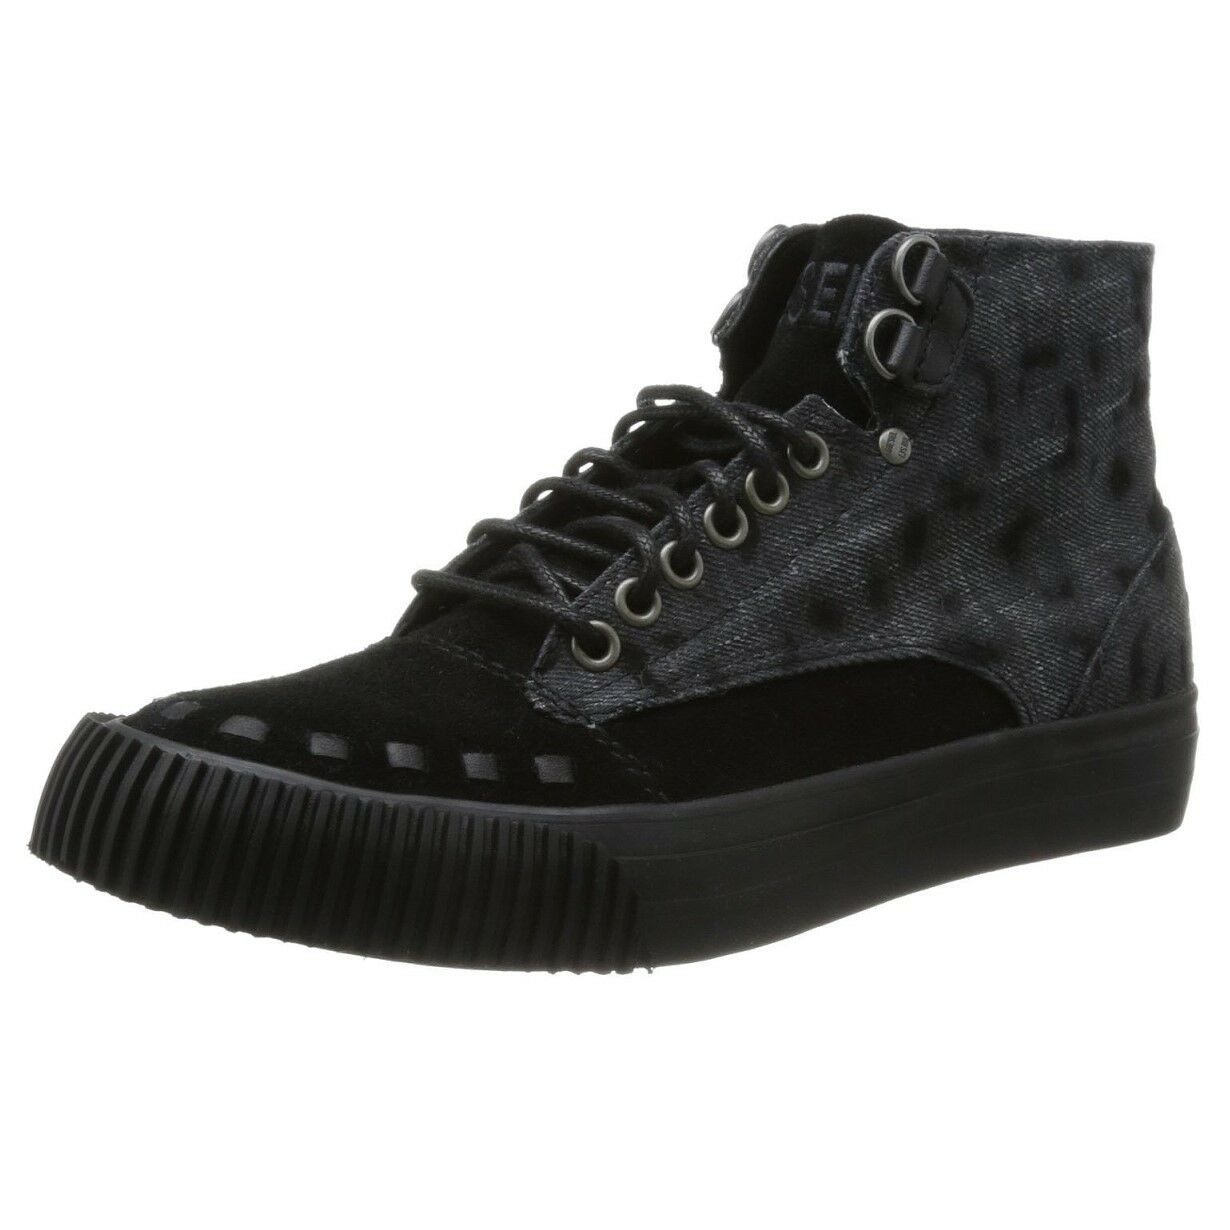 Diesel LAIKA PERSIS W metà Leopardo Stampa Sneaker women shoes da ginnastica